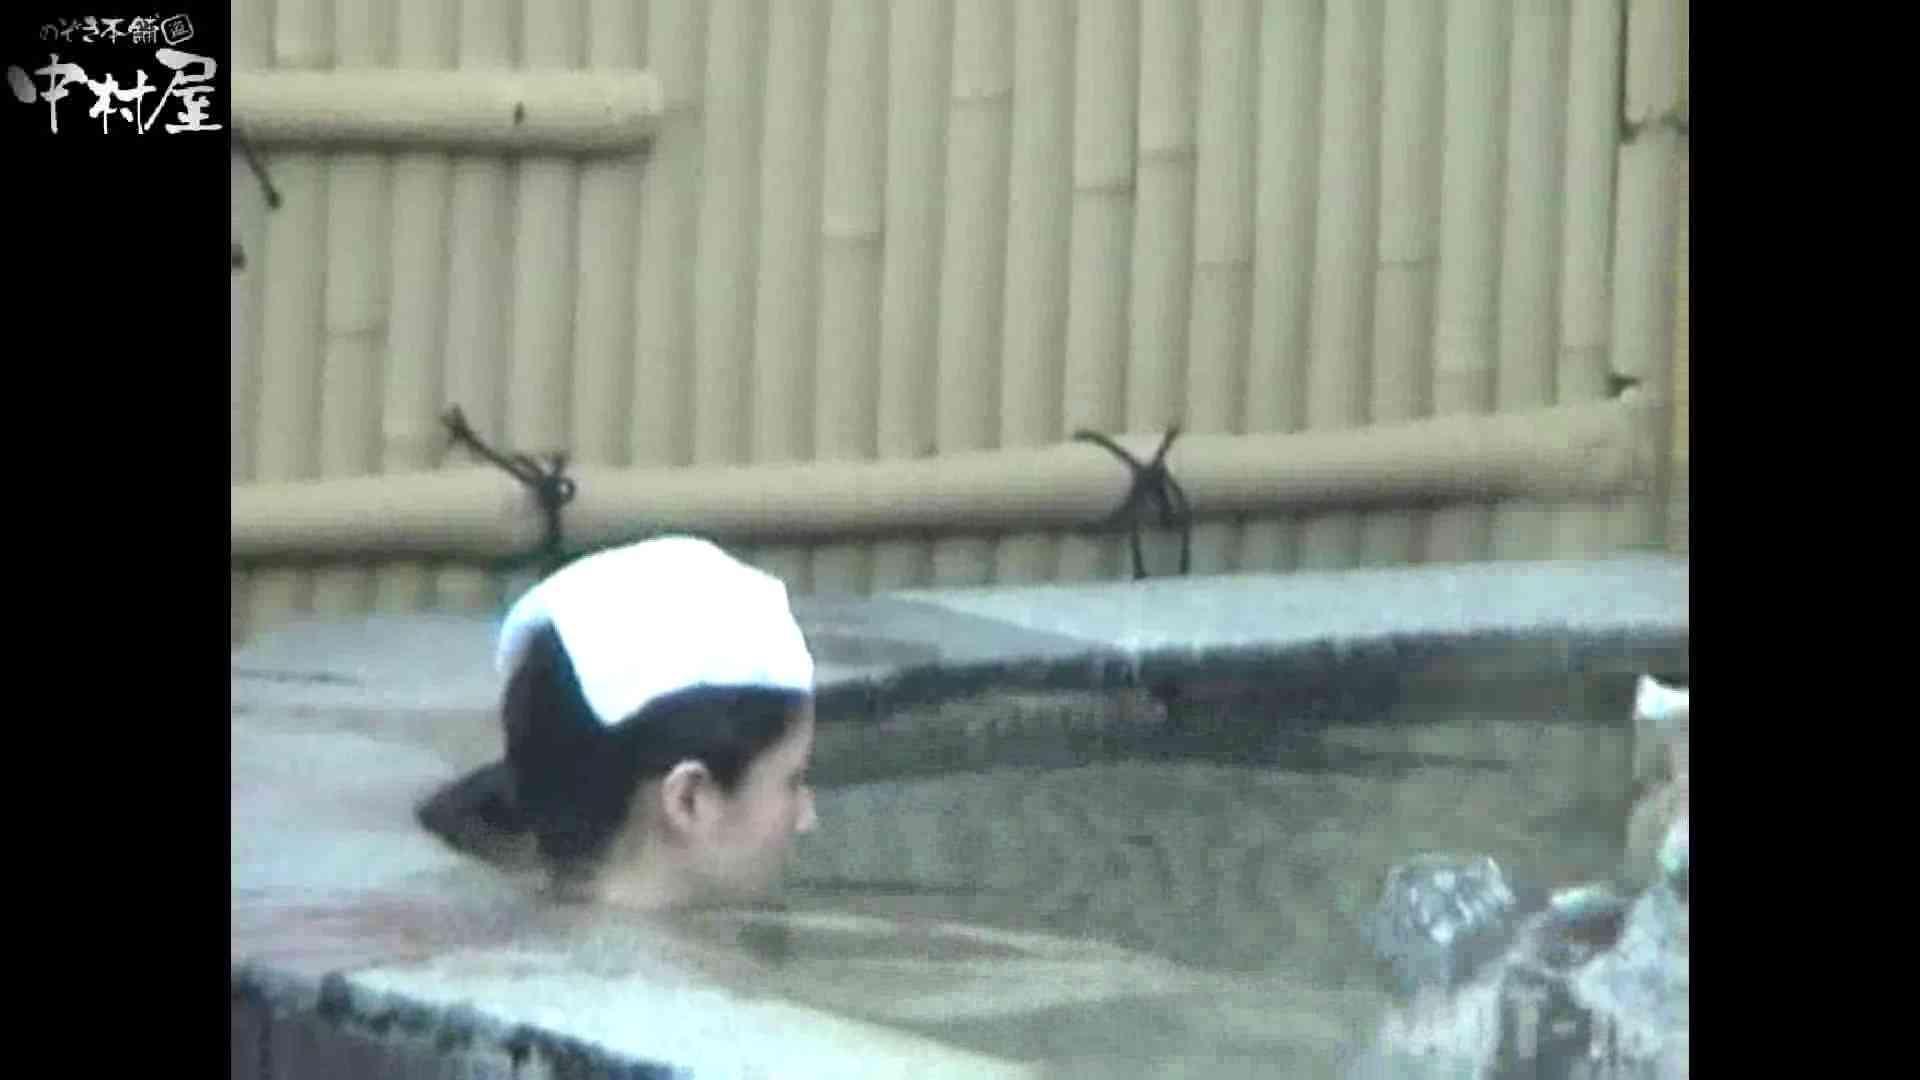 Aquaな露天風呂Vol.880潜入盗撮露天風呂十六判湯 其の六 露天 | 潜入シリーズ  95pic 27